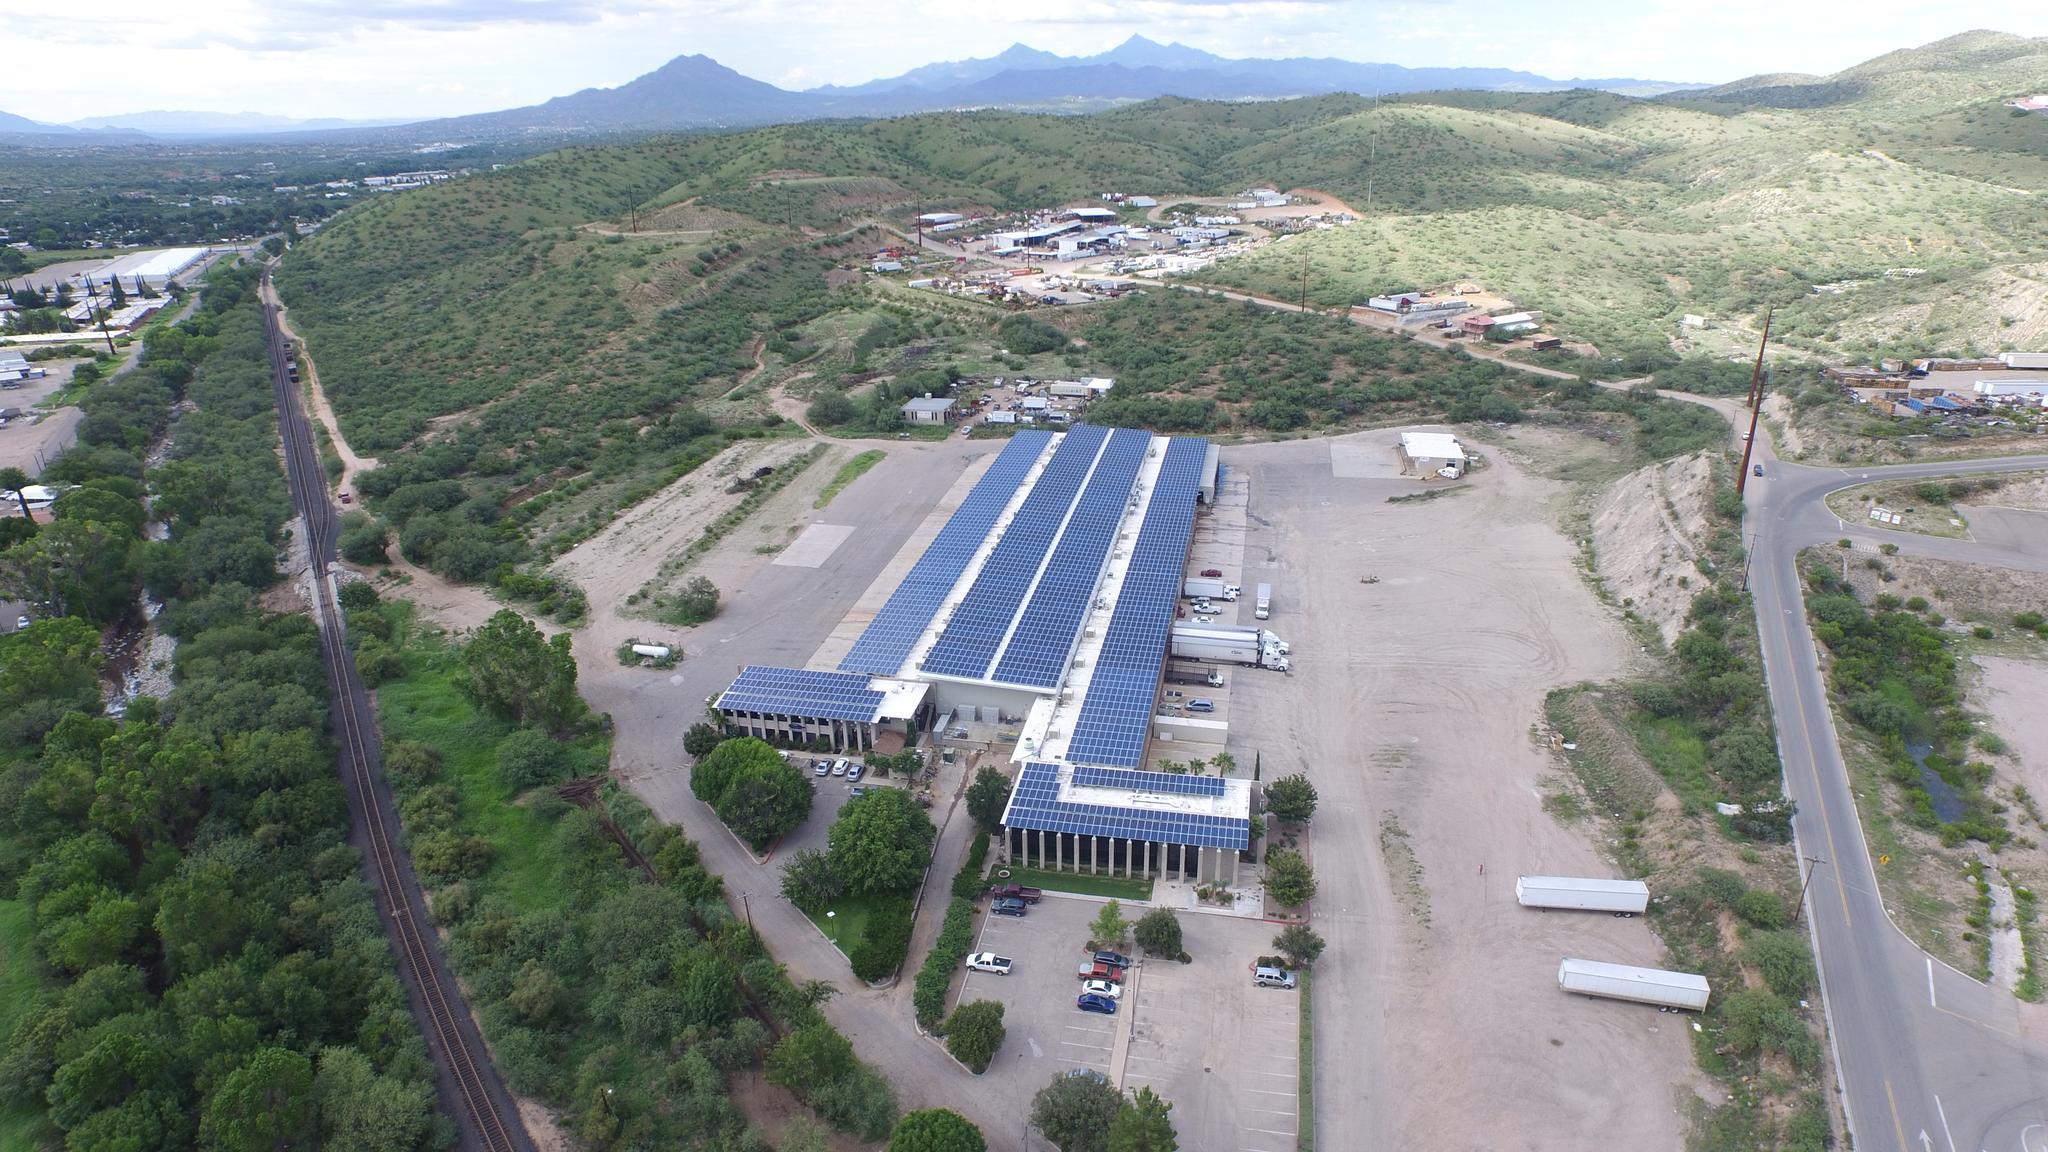 1 Mega Watt Commercial Cold Storage Warehouse Energysage